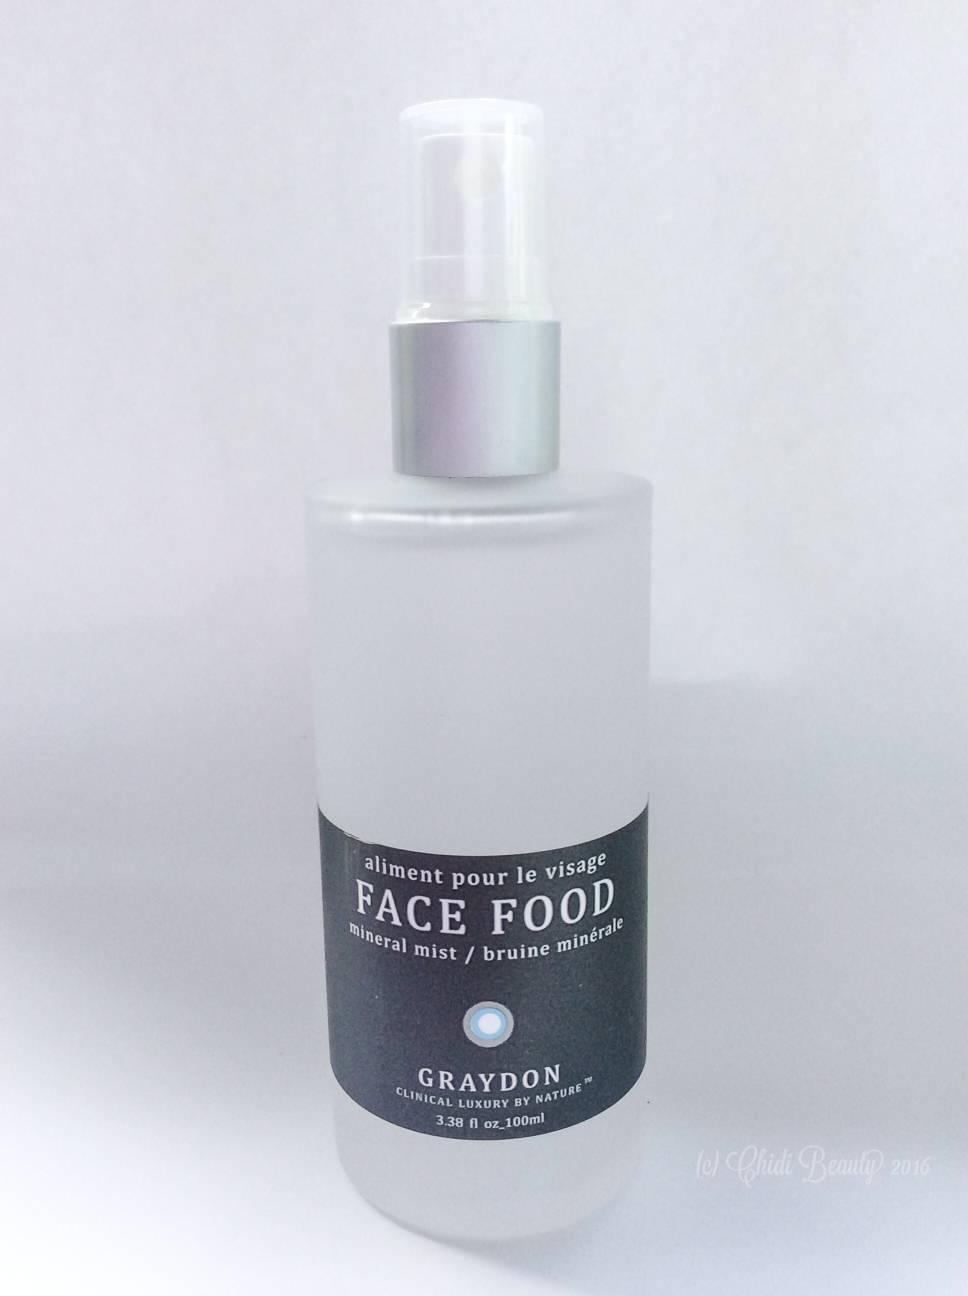 Graydon Face Food Mineral Mist